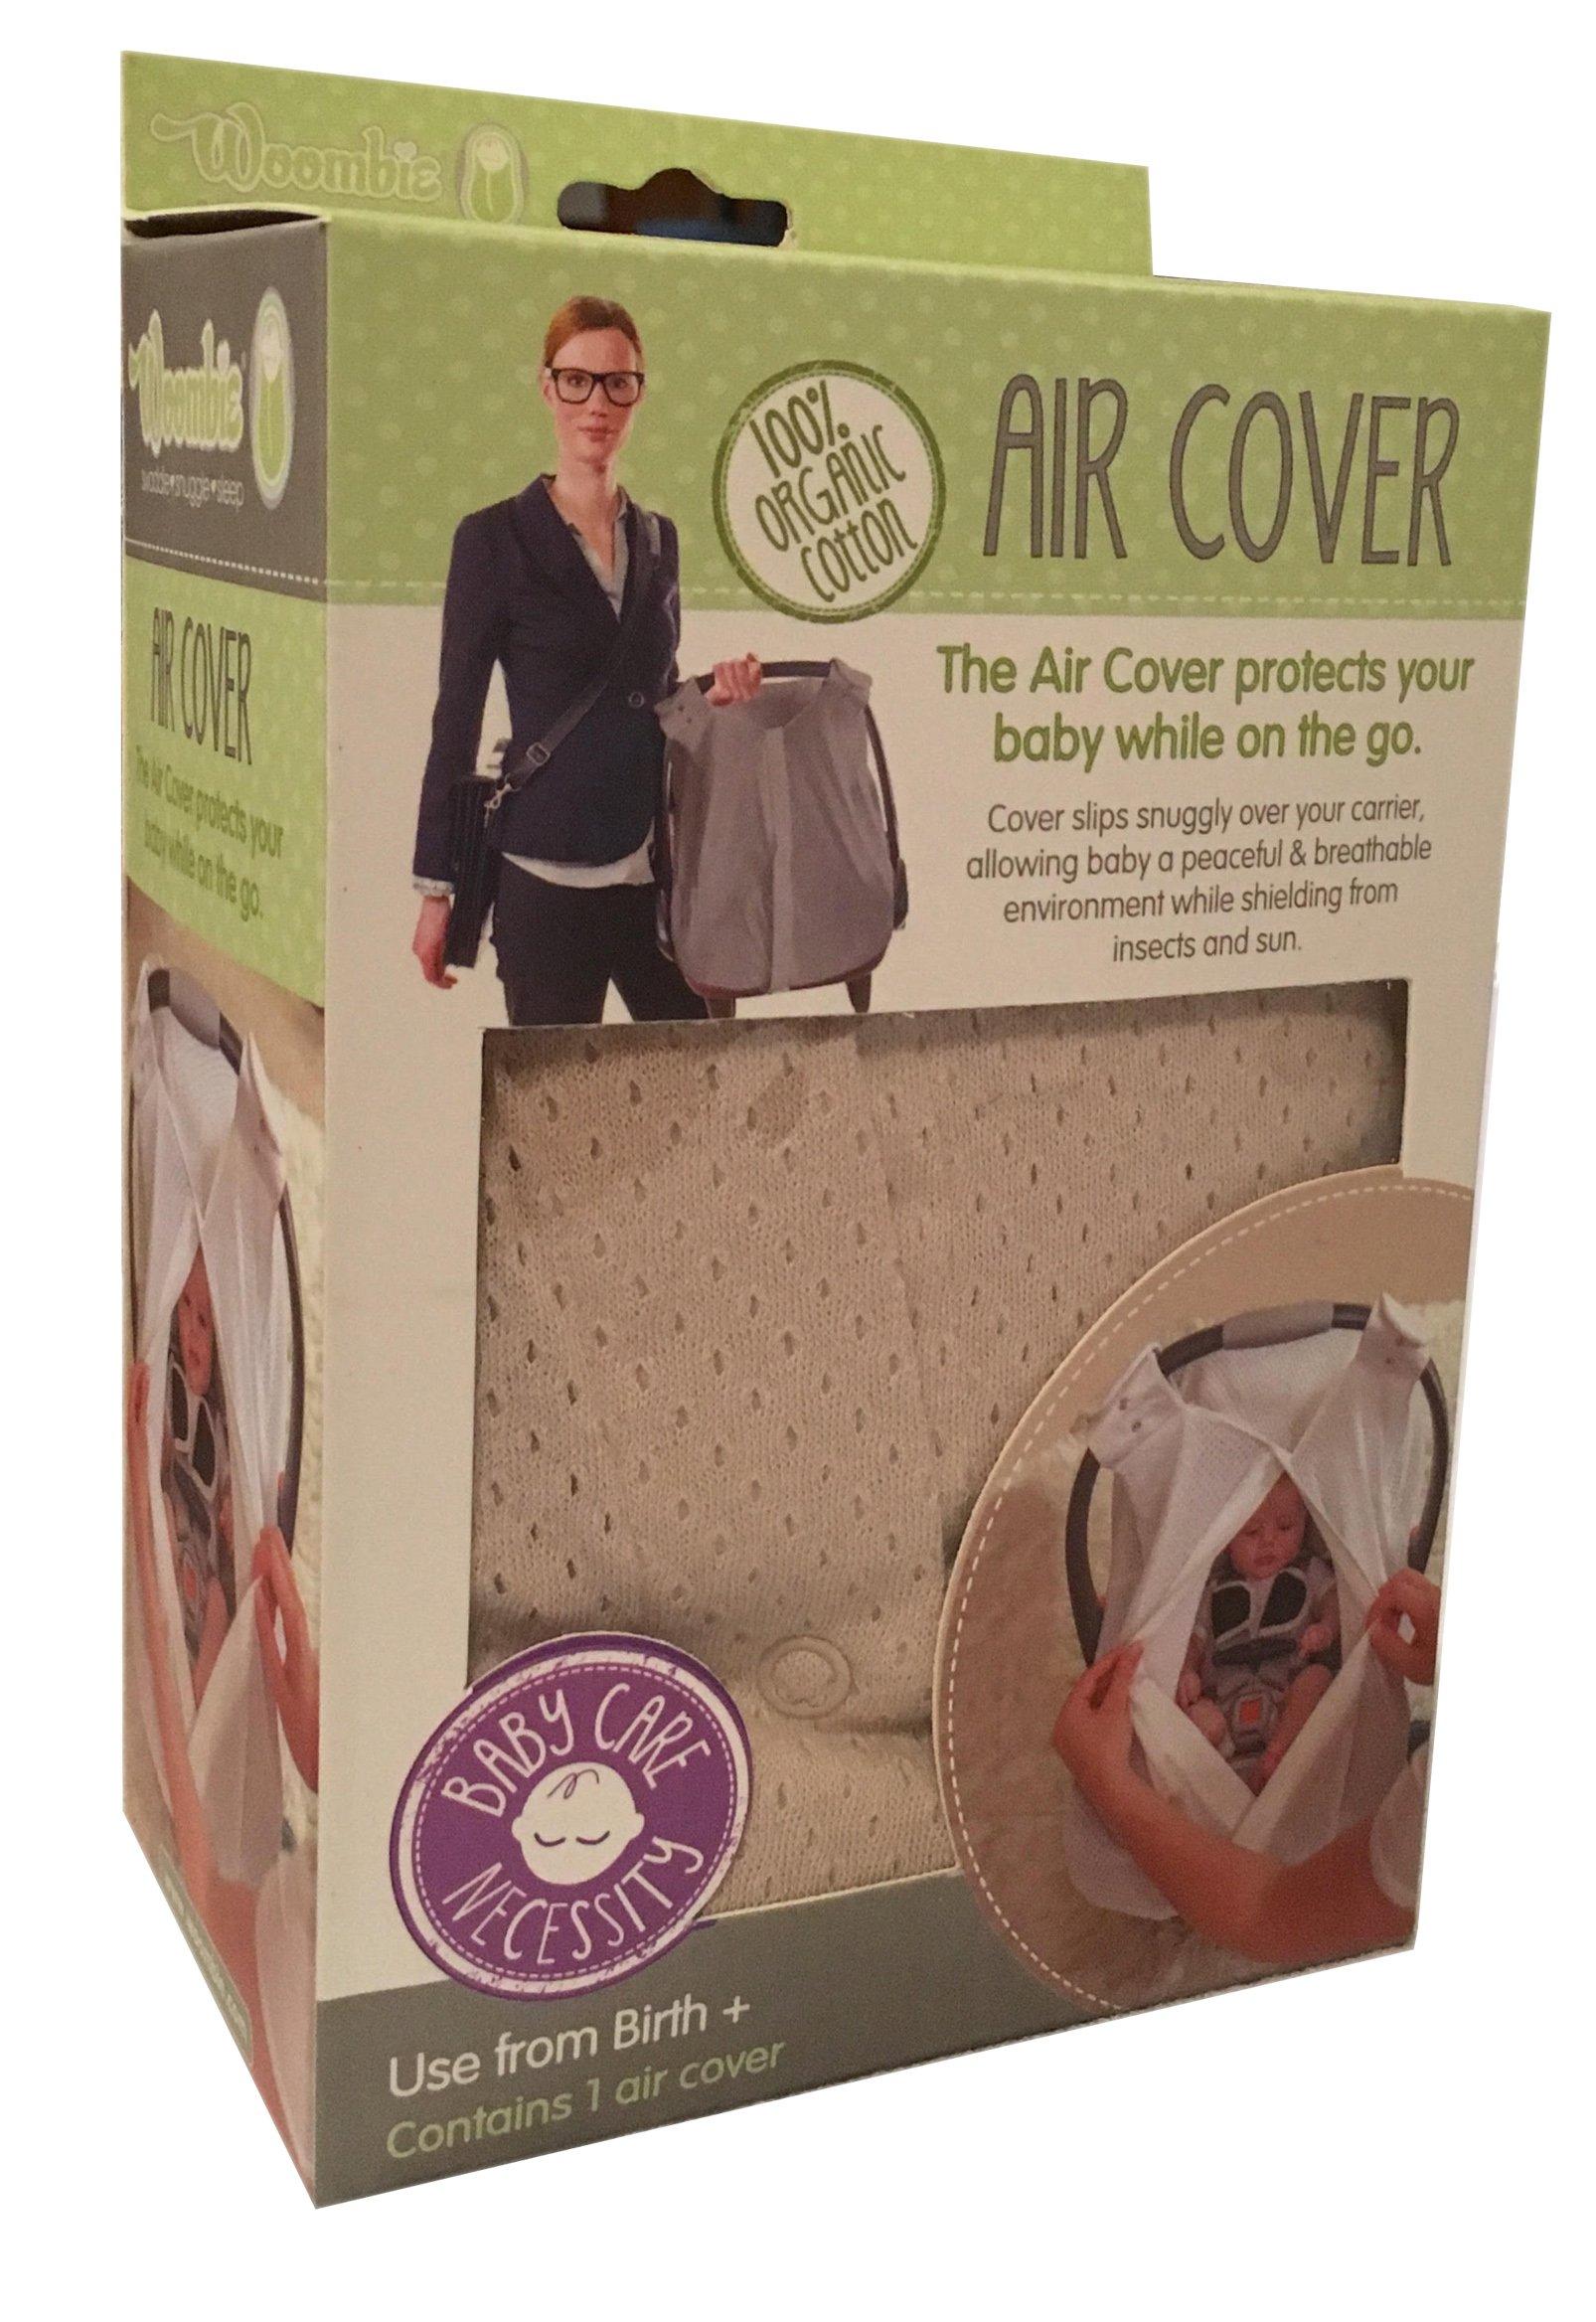 Woombie Organic Air Cover, Beige